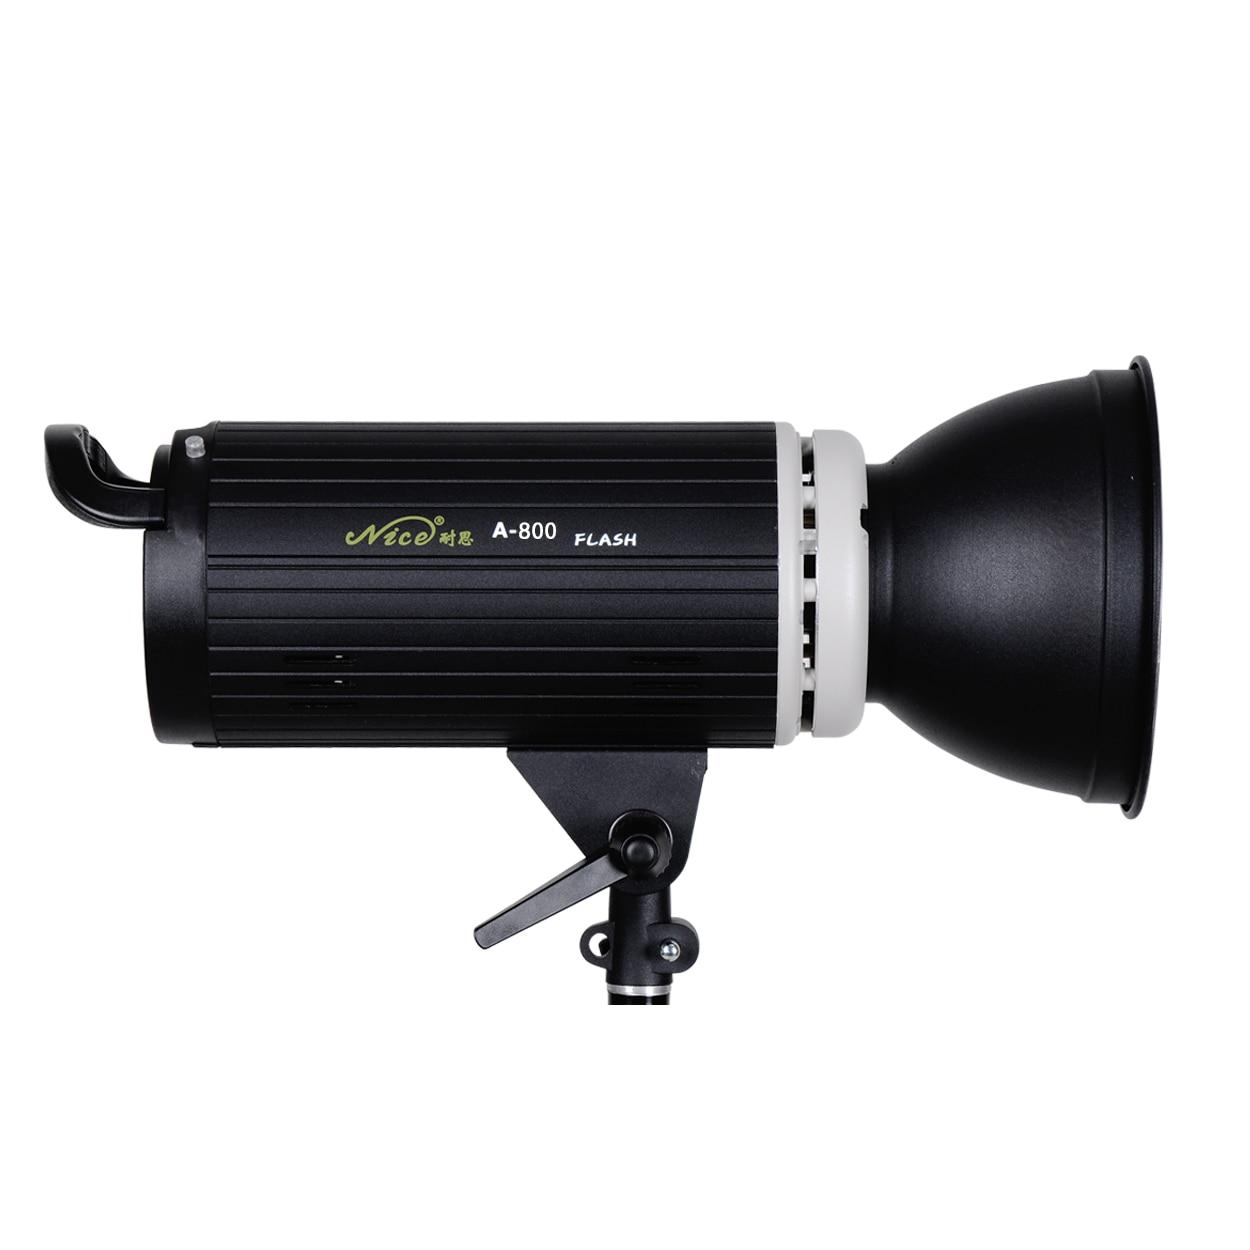 NiceFoto a-800w professional studio lights flash light photography light equipment single lamp dicens ld 200 u2 studio lights 200w flash lamp flash light photography light flash light